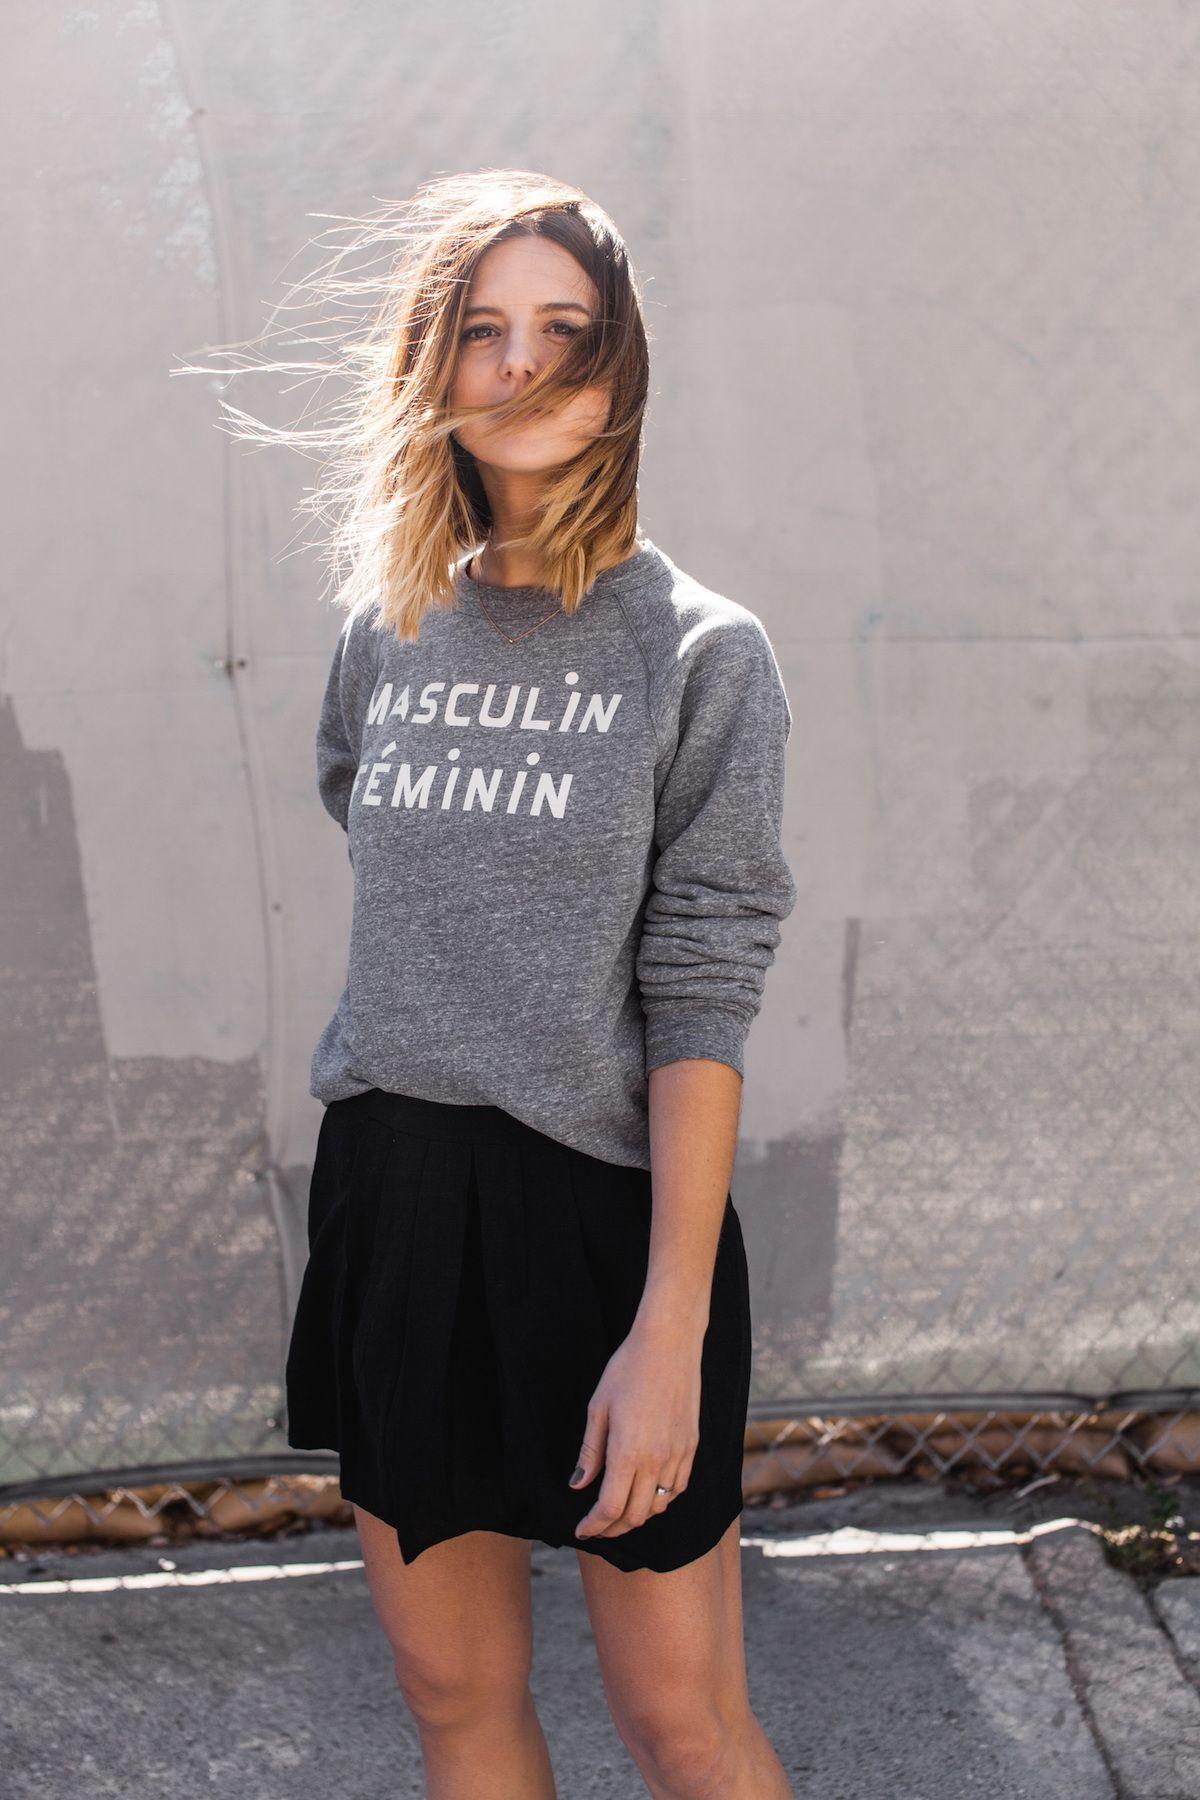 Clare V Masculin Feminin sweatshirt 8de54af45b6de